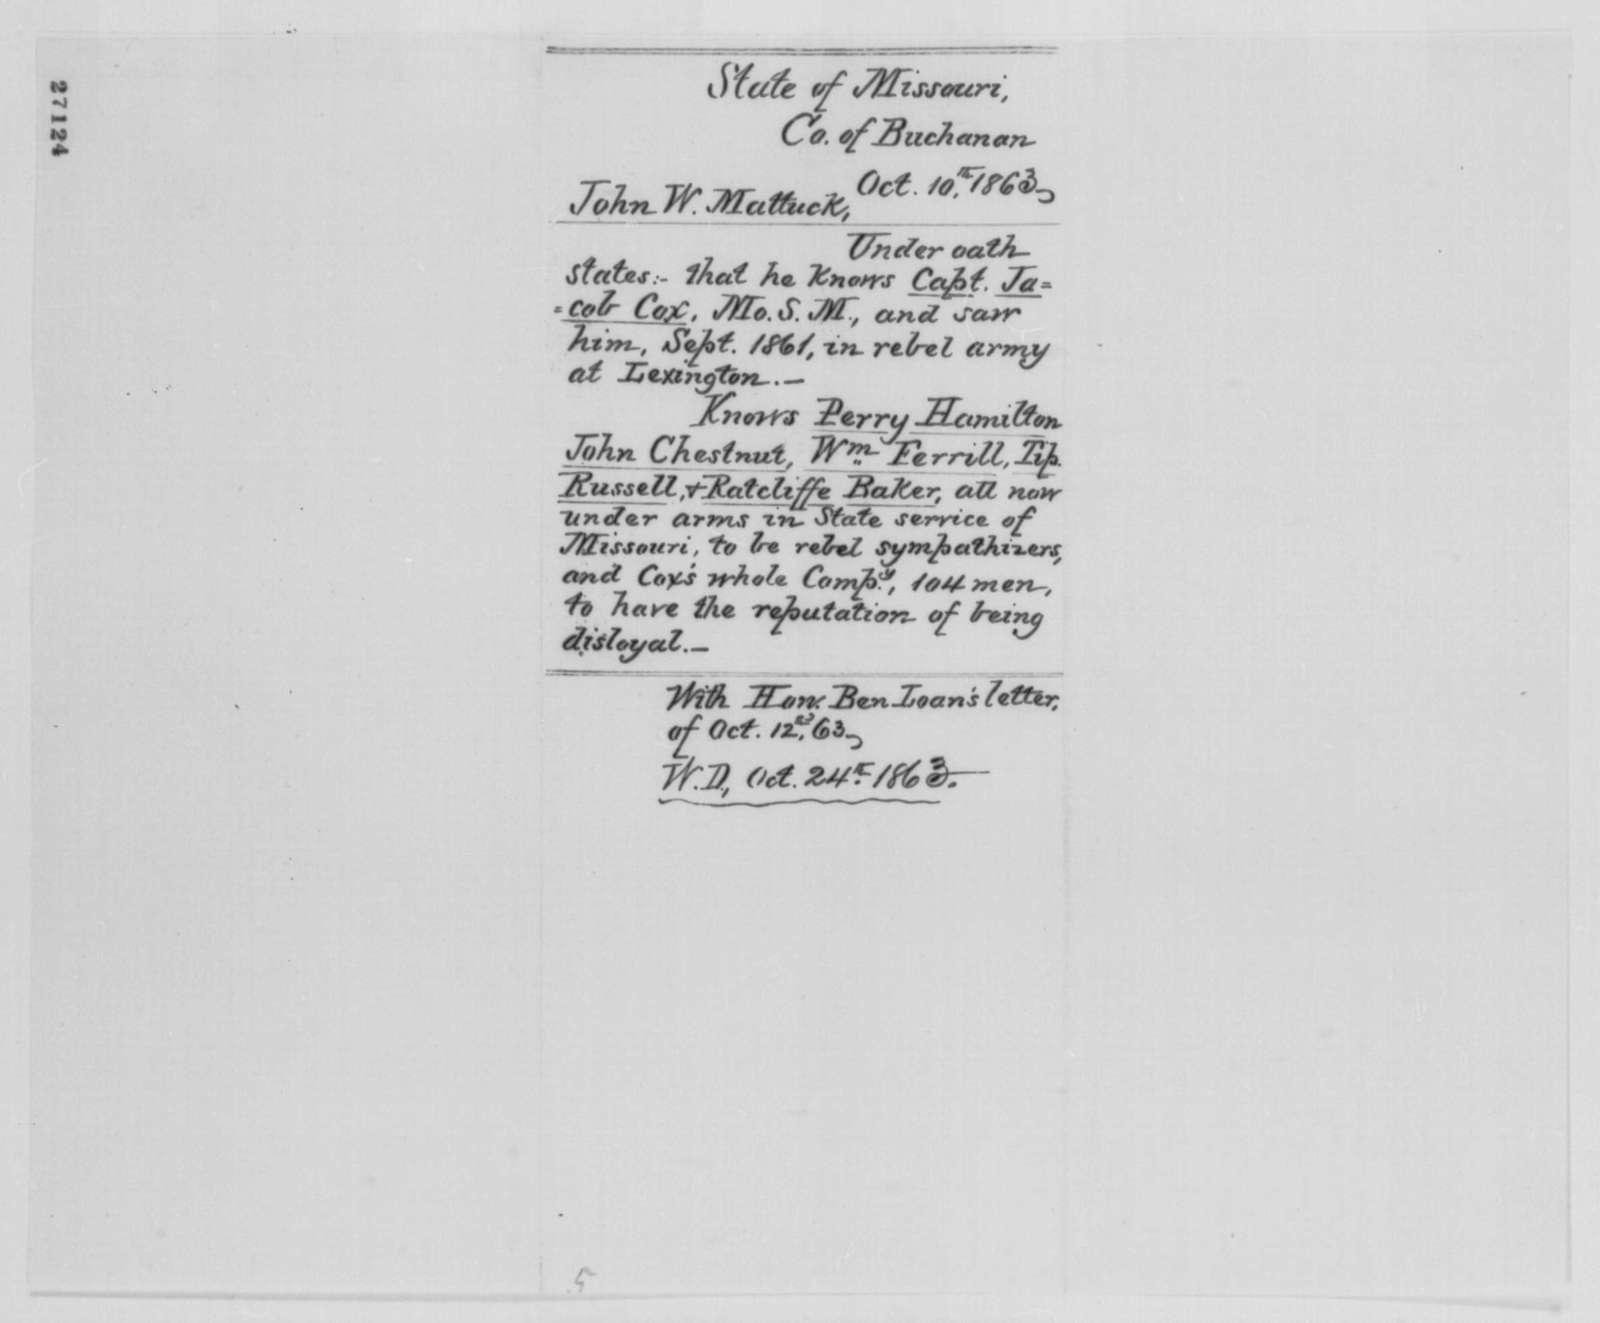 John W. Mattucks, Saturday, October 10, 1863  (Affidavit concerning military affairs in Missouri)